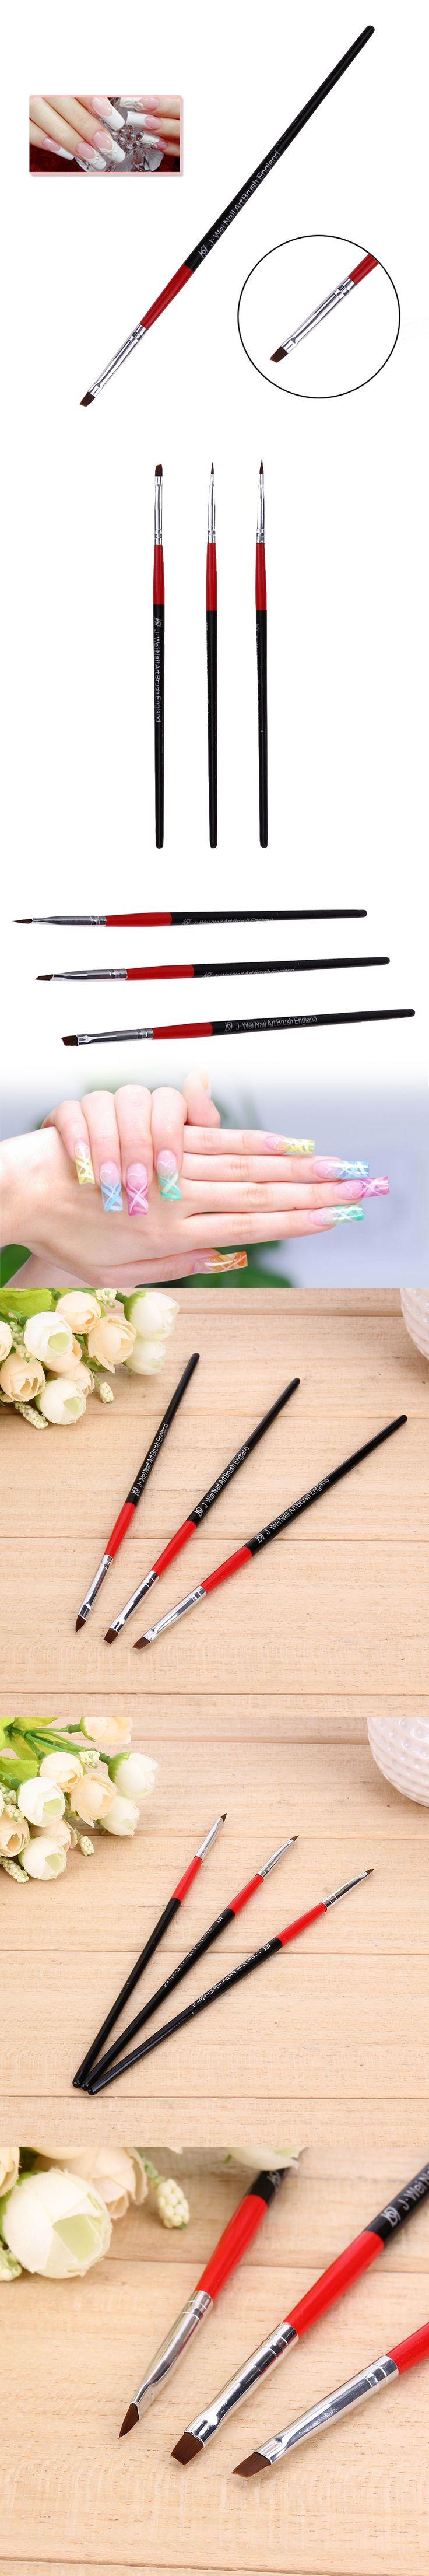 3pcs/set Nail Art Painting Pen Set Nail Brushes Gel Polish Beauty Nail Polish Pen Tools Wood Handle 3D Design Drawing Line Brush